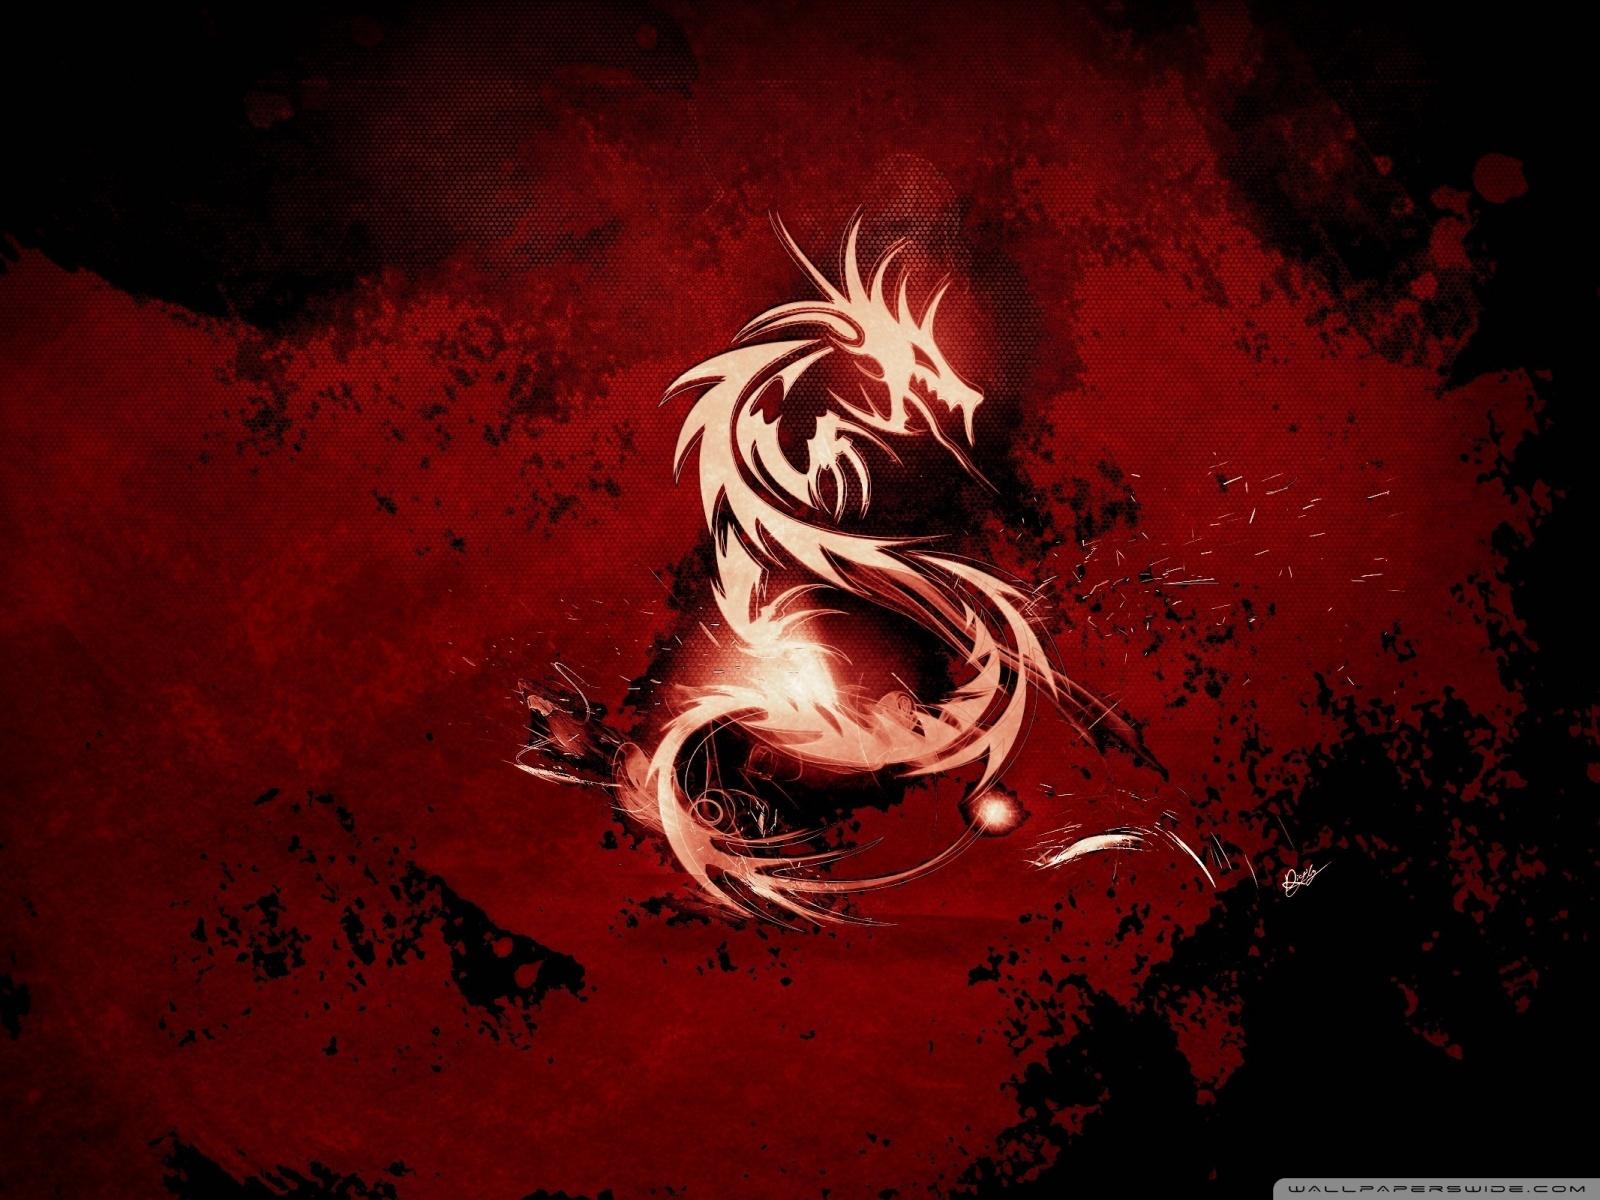 Free Mortal Kombat Logo phone wallpaper by edpr86